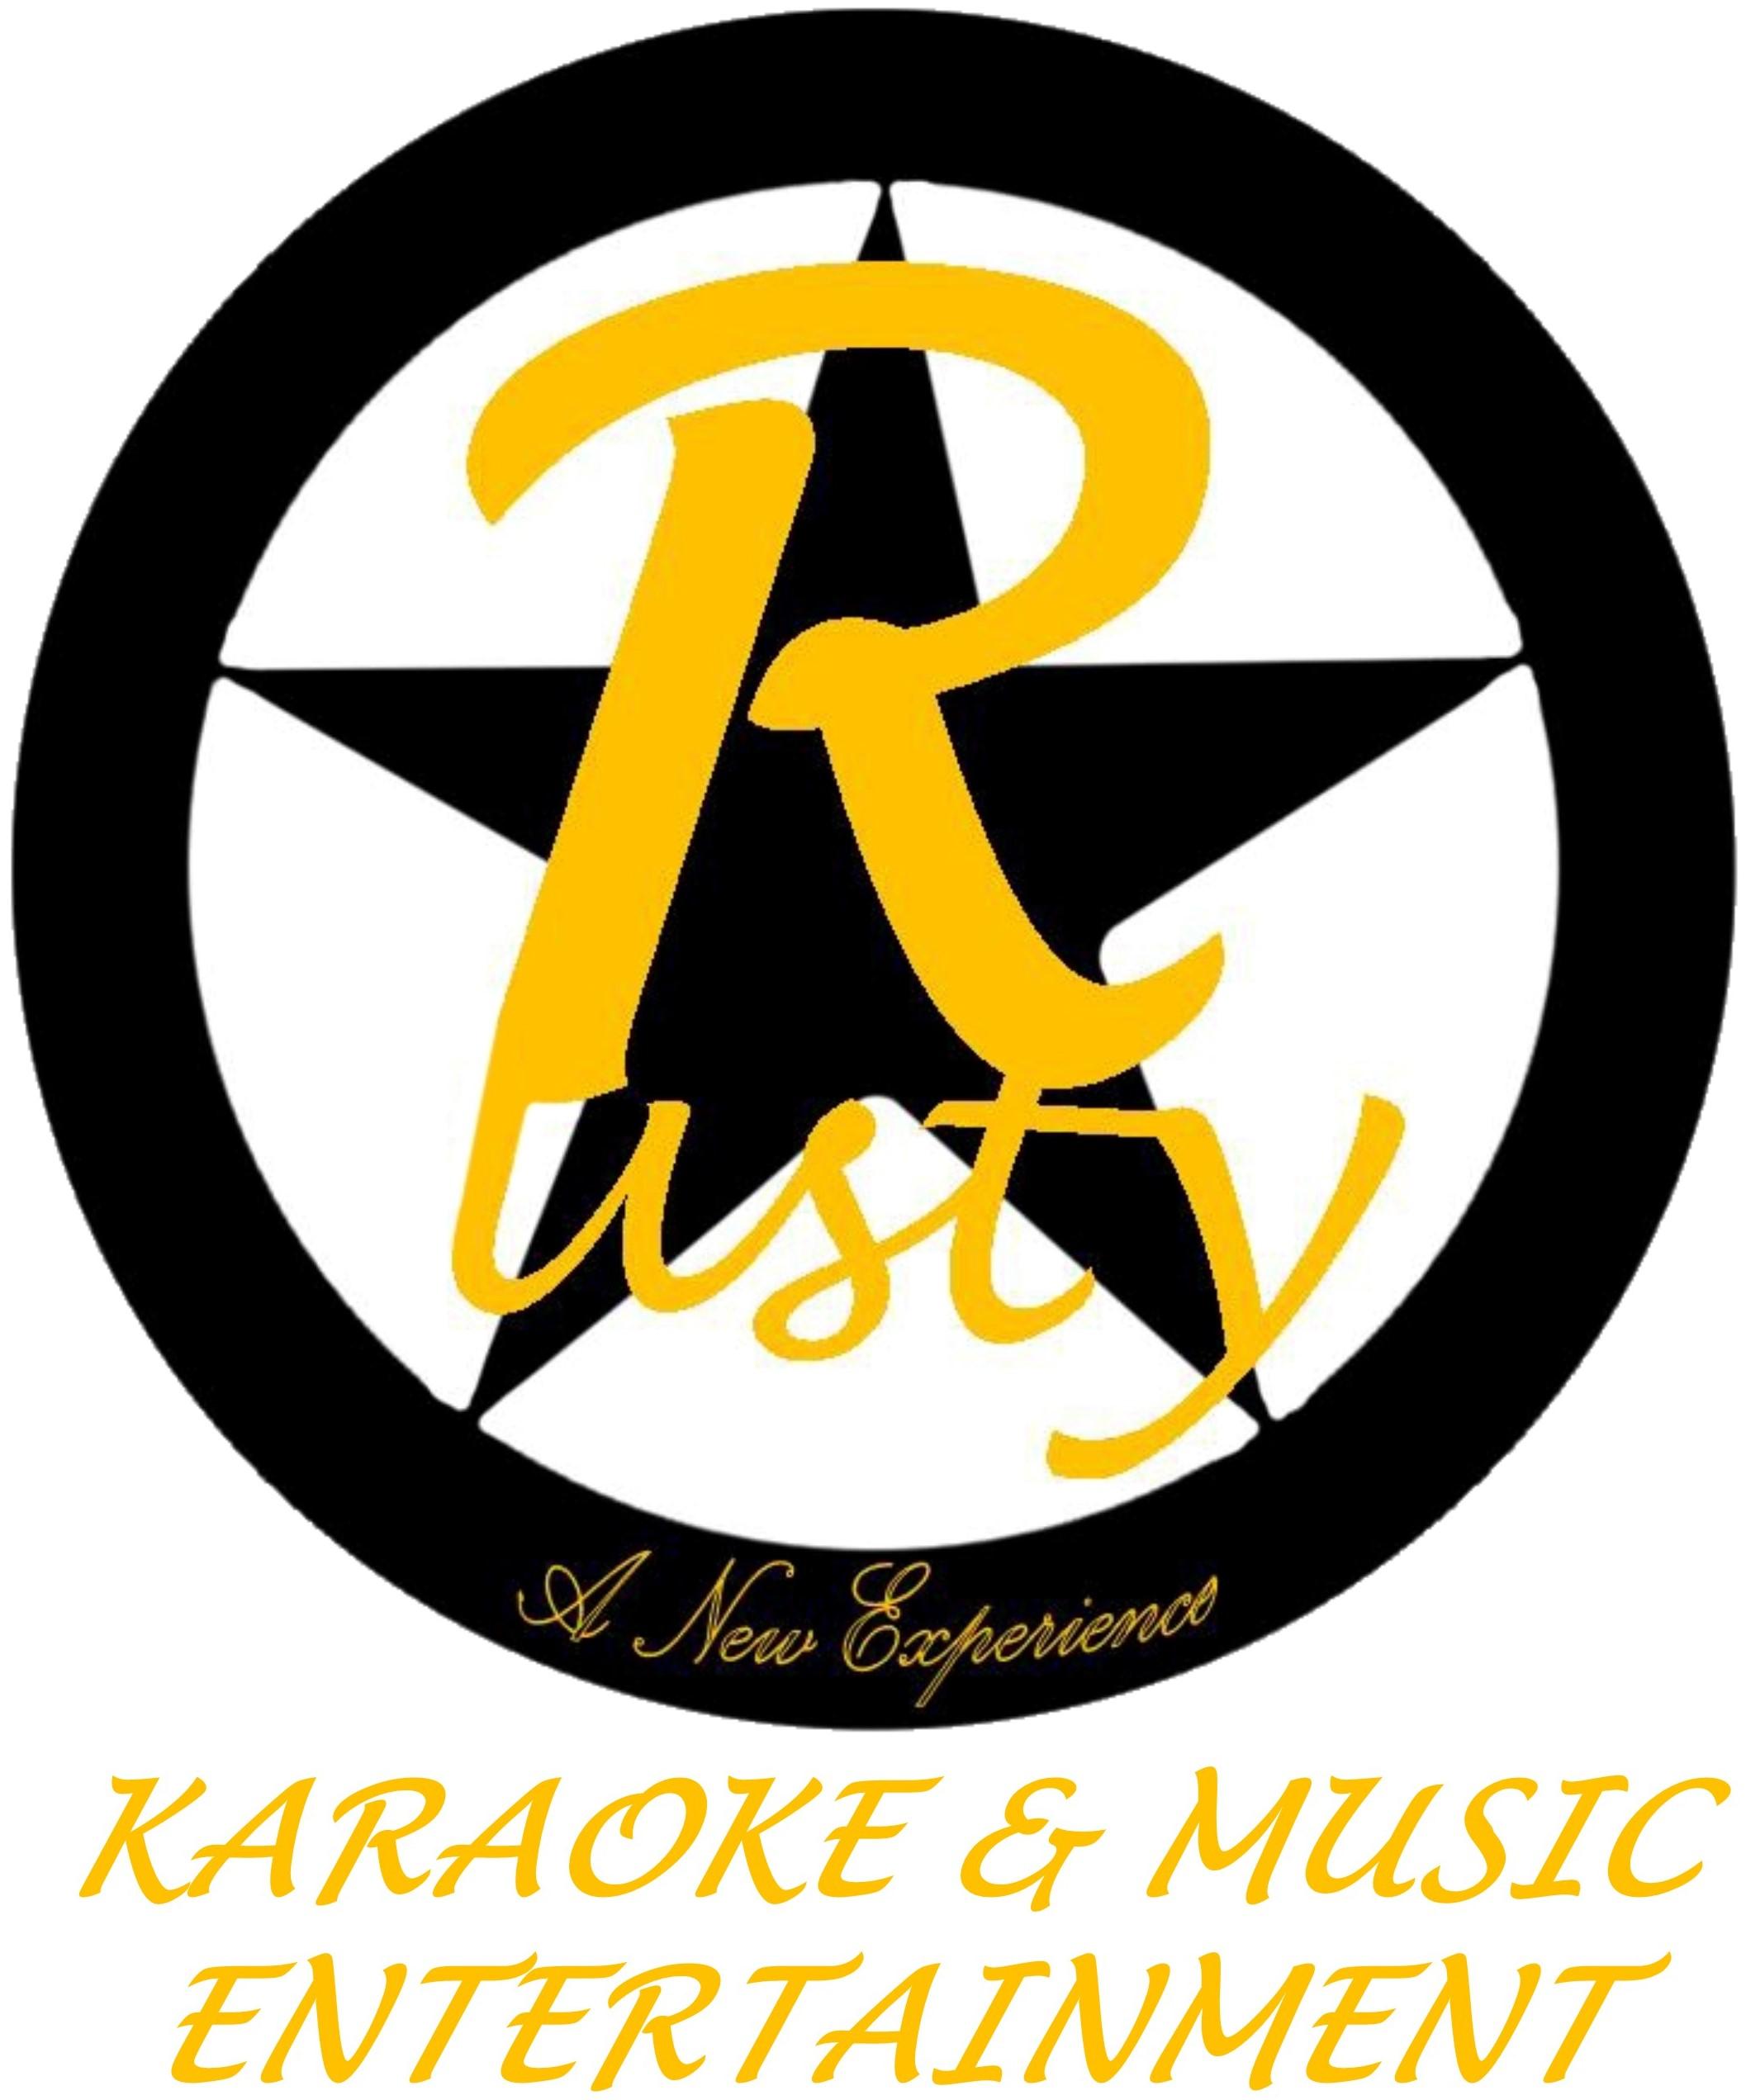 Rusty Karaoke&Music Entertainment schwarz auf weiss-Logo